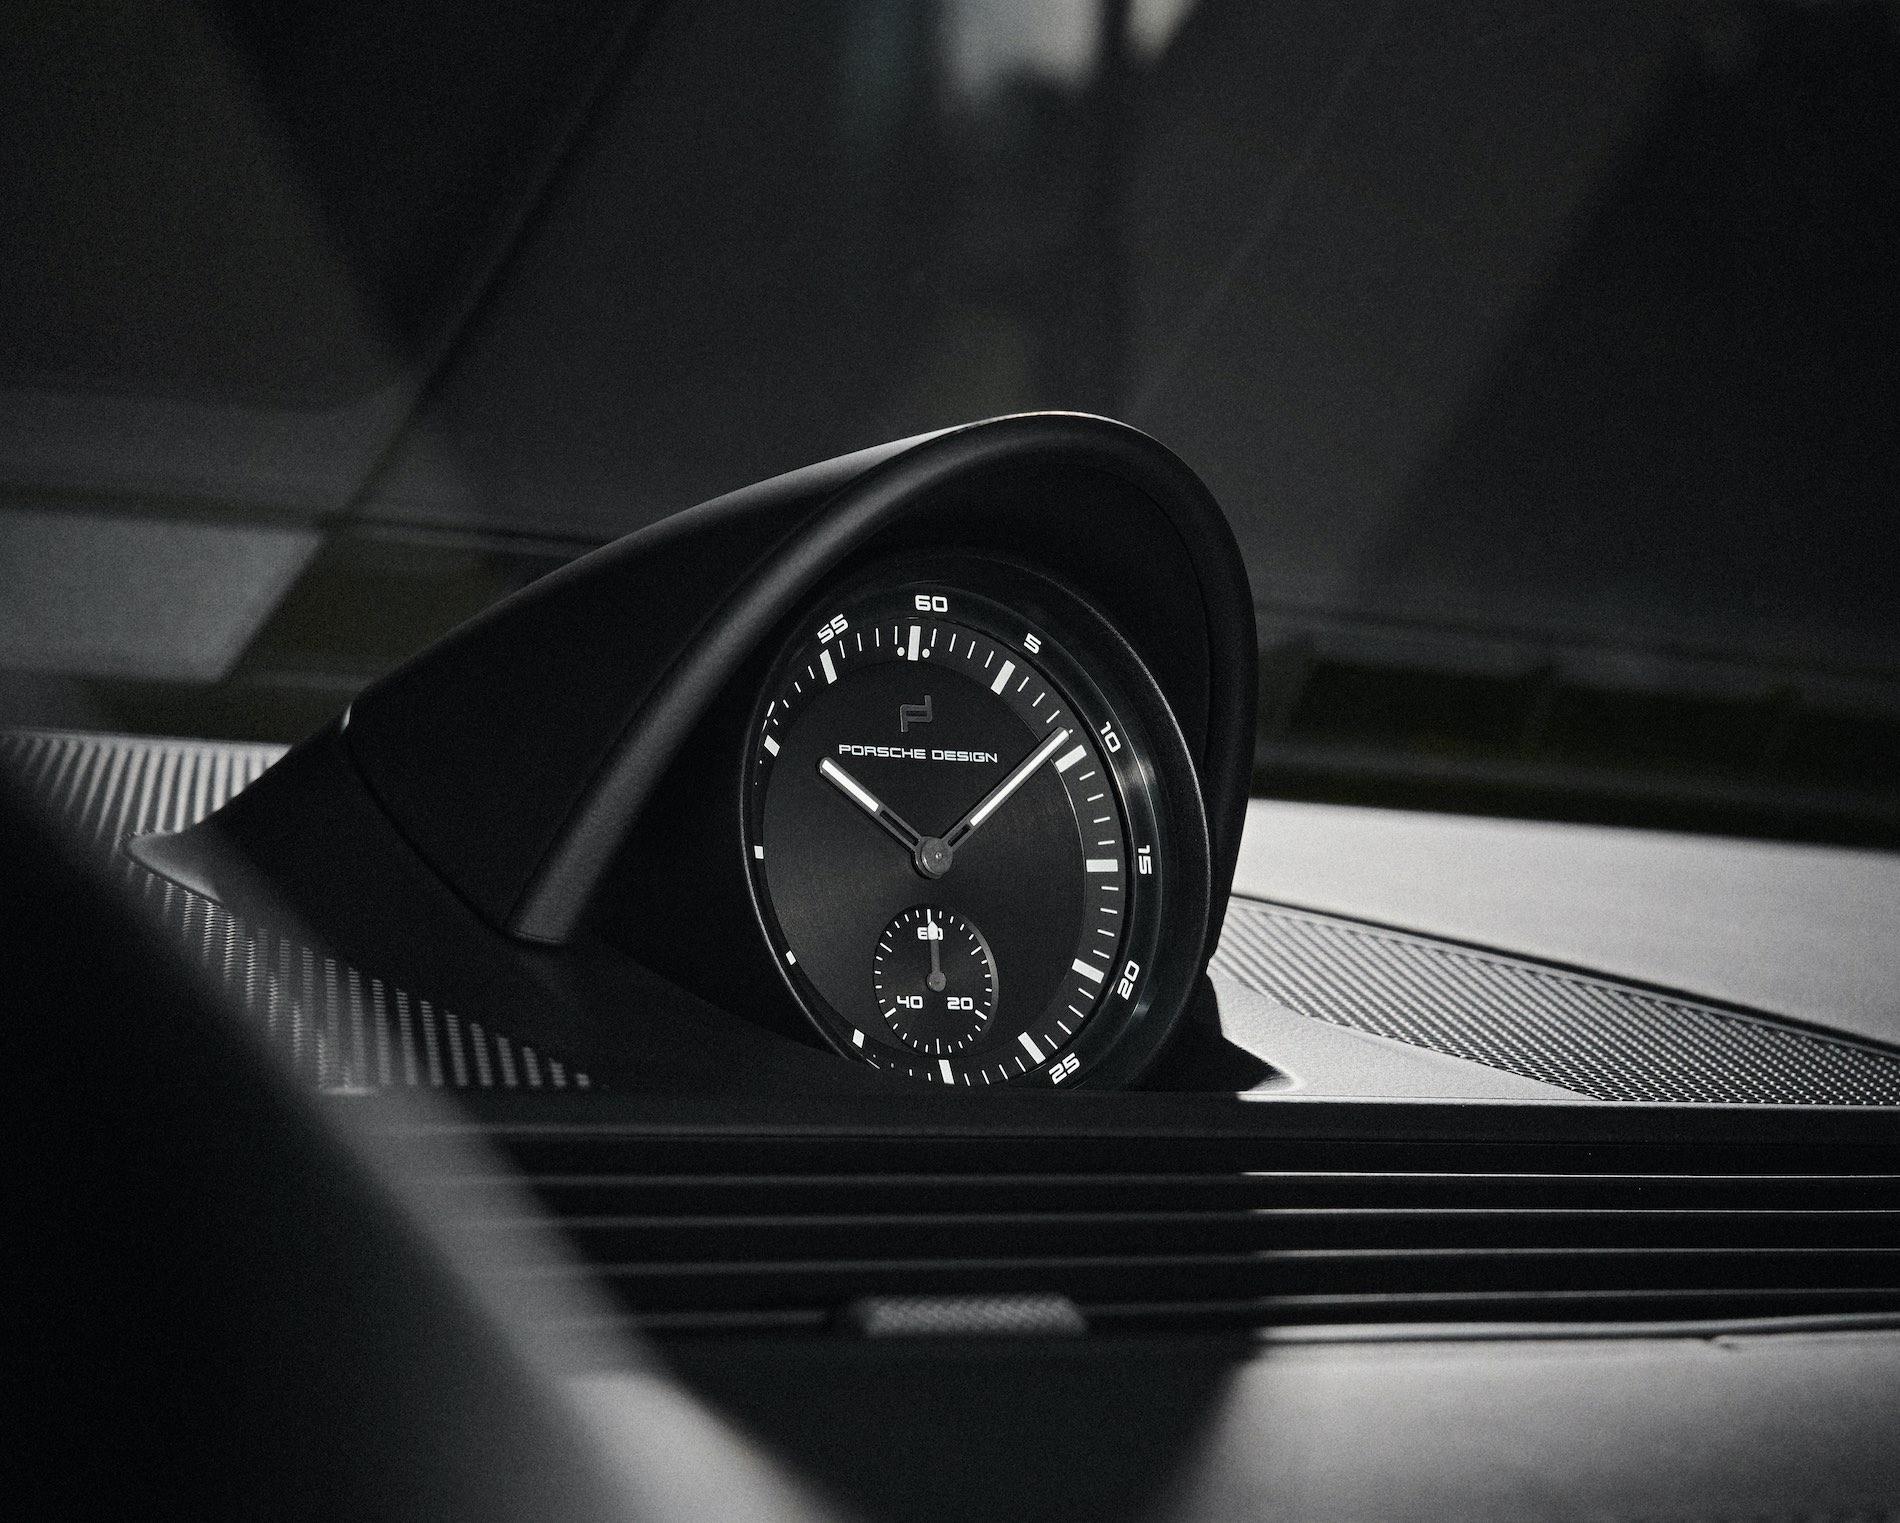 Porsche Design Sport Chrono Sub Second Panamera - 21